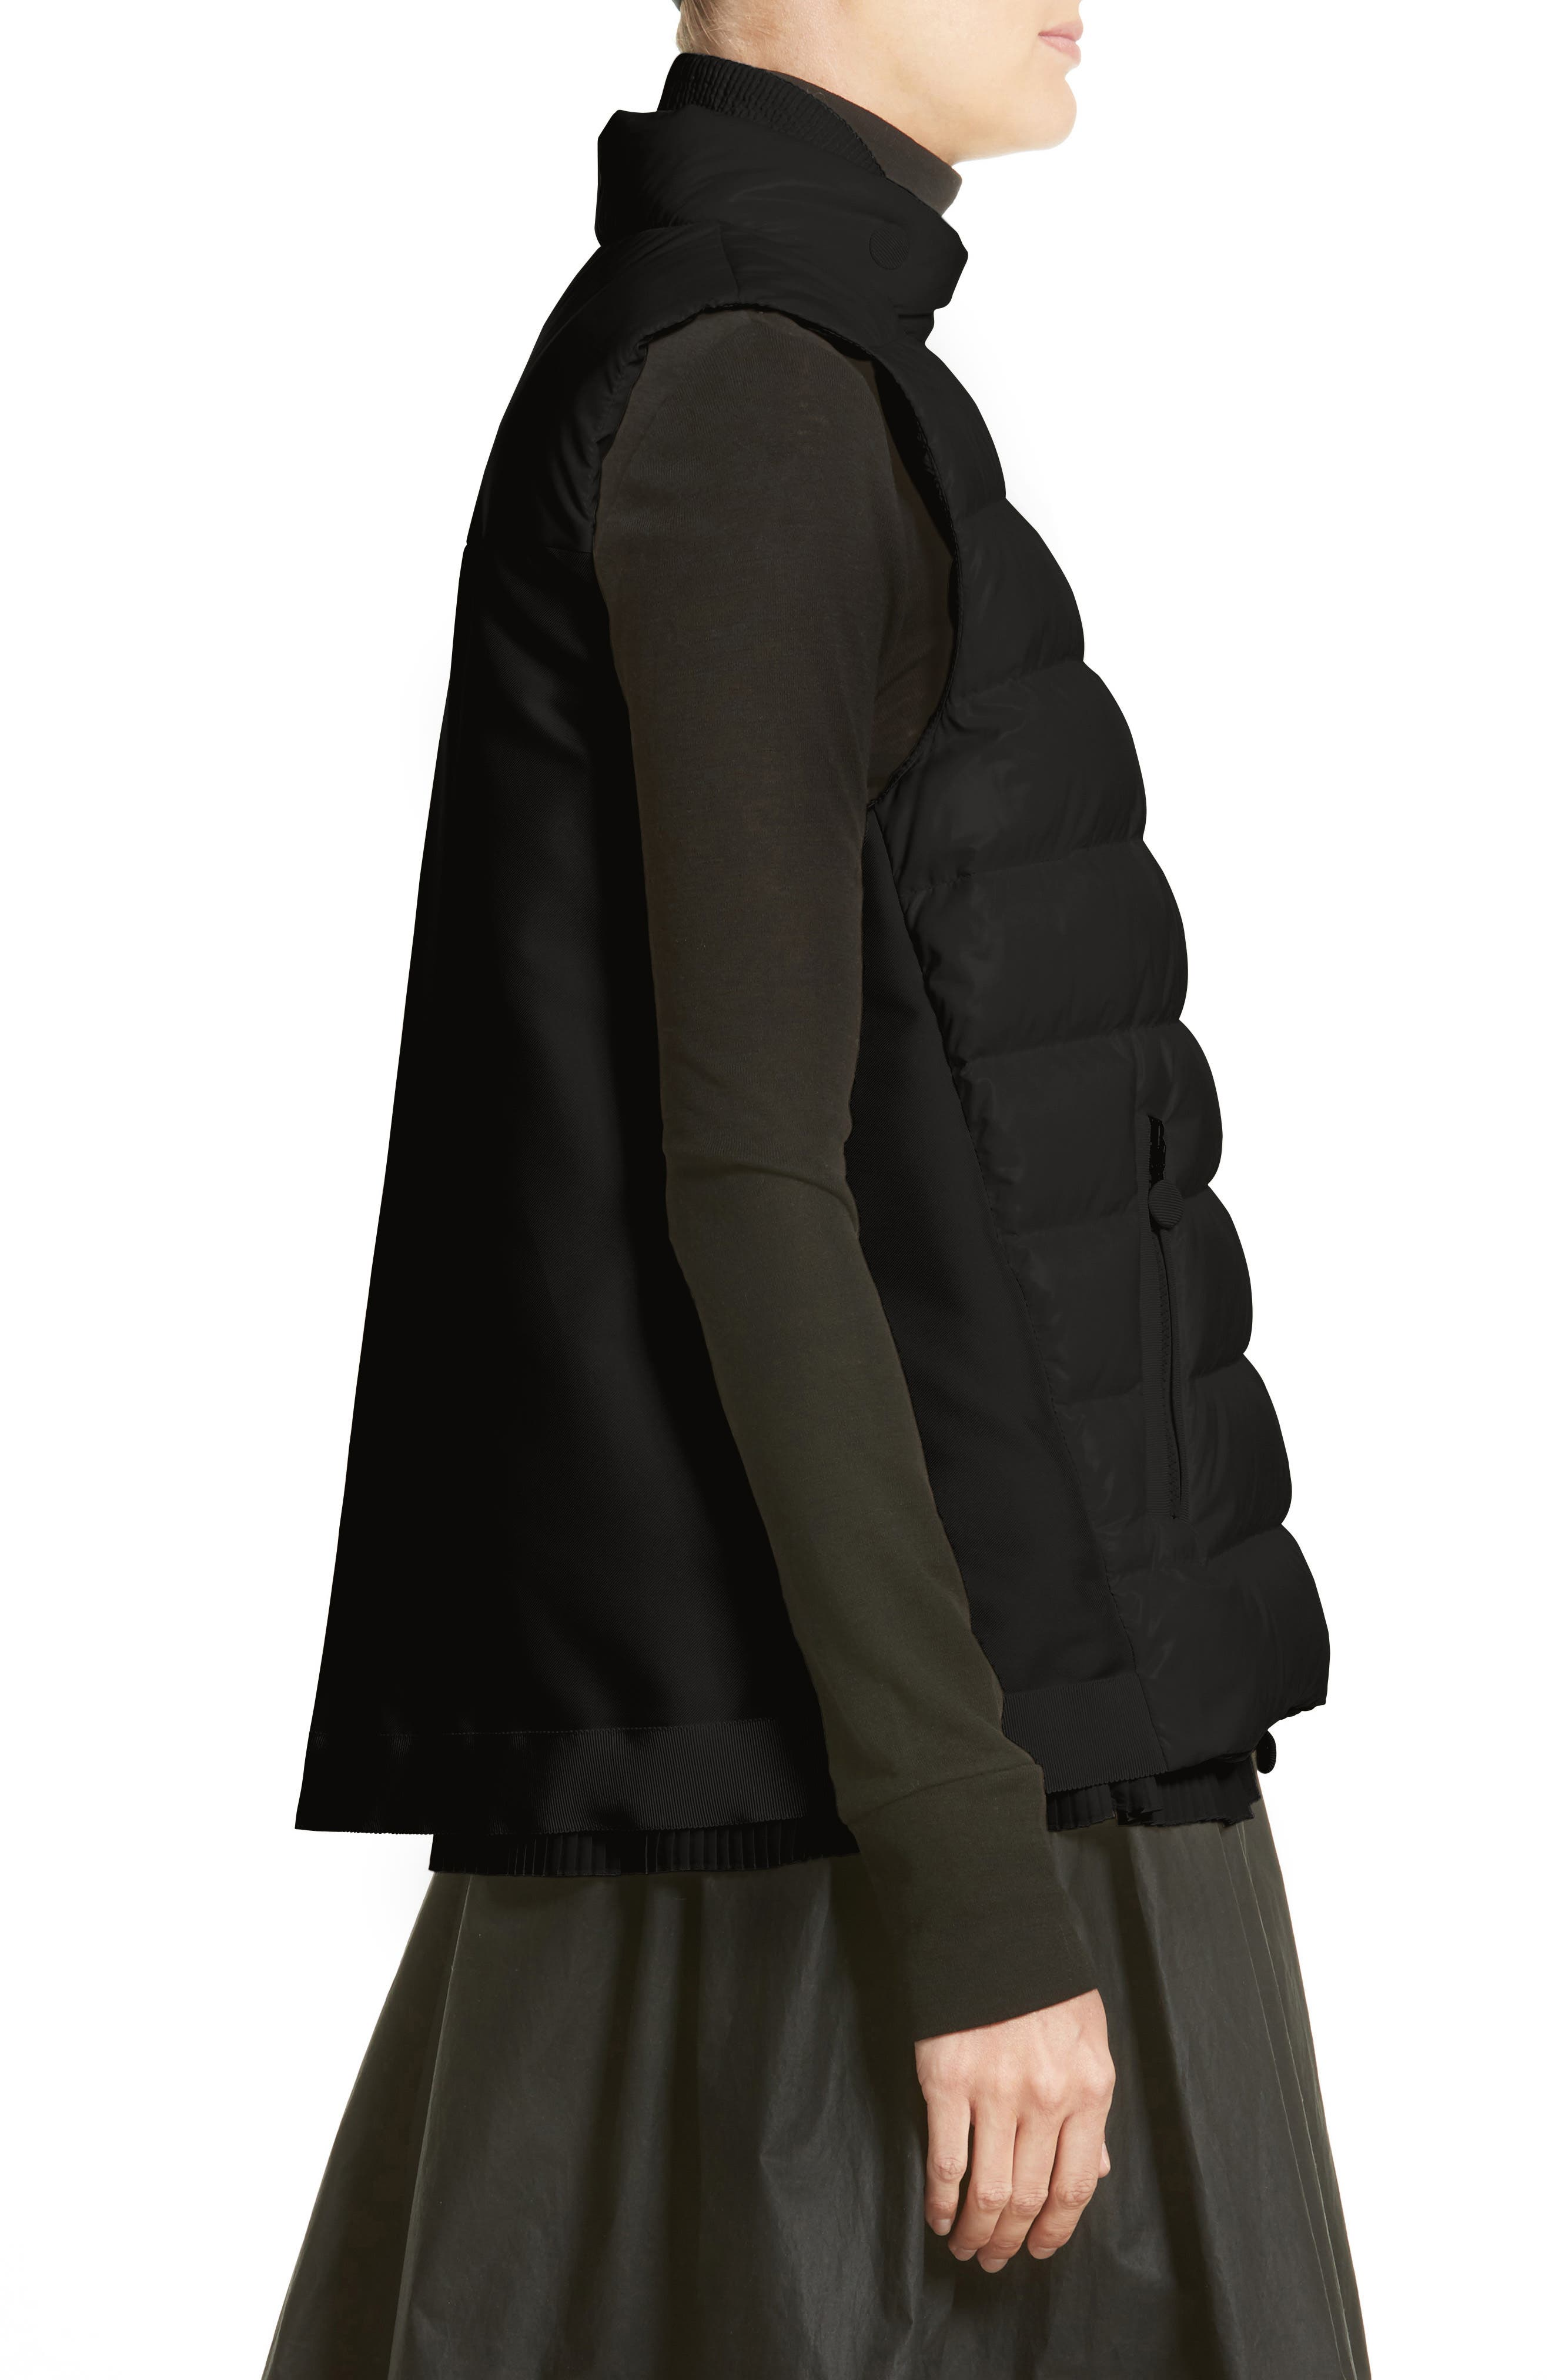 Jane Mixed Media Down Puffer Vest,                             Alternate thumbnail 3, color,                             001